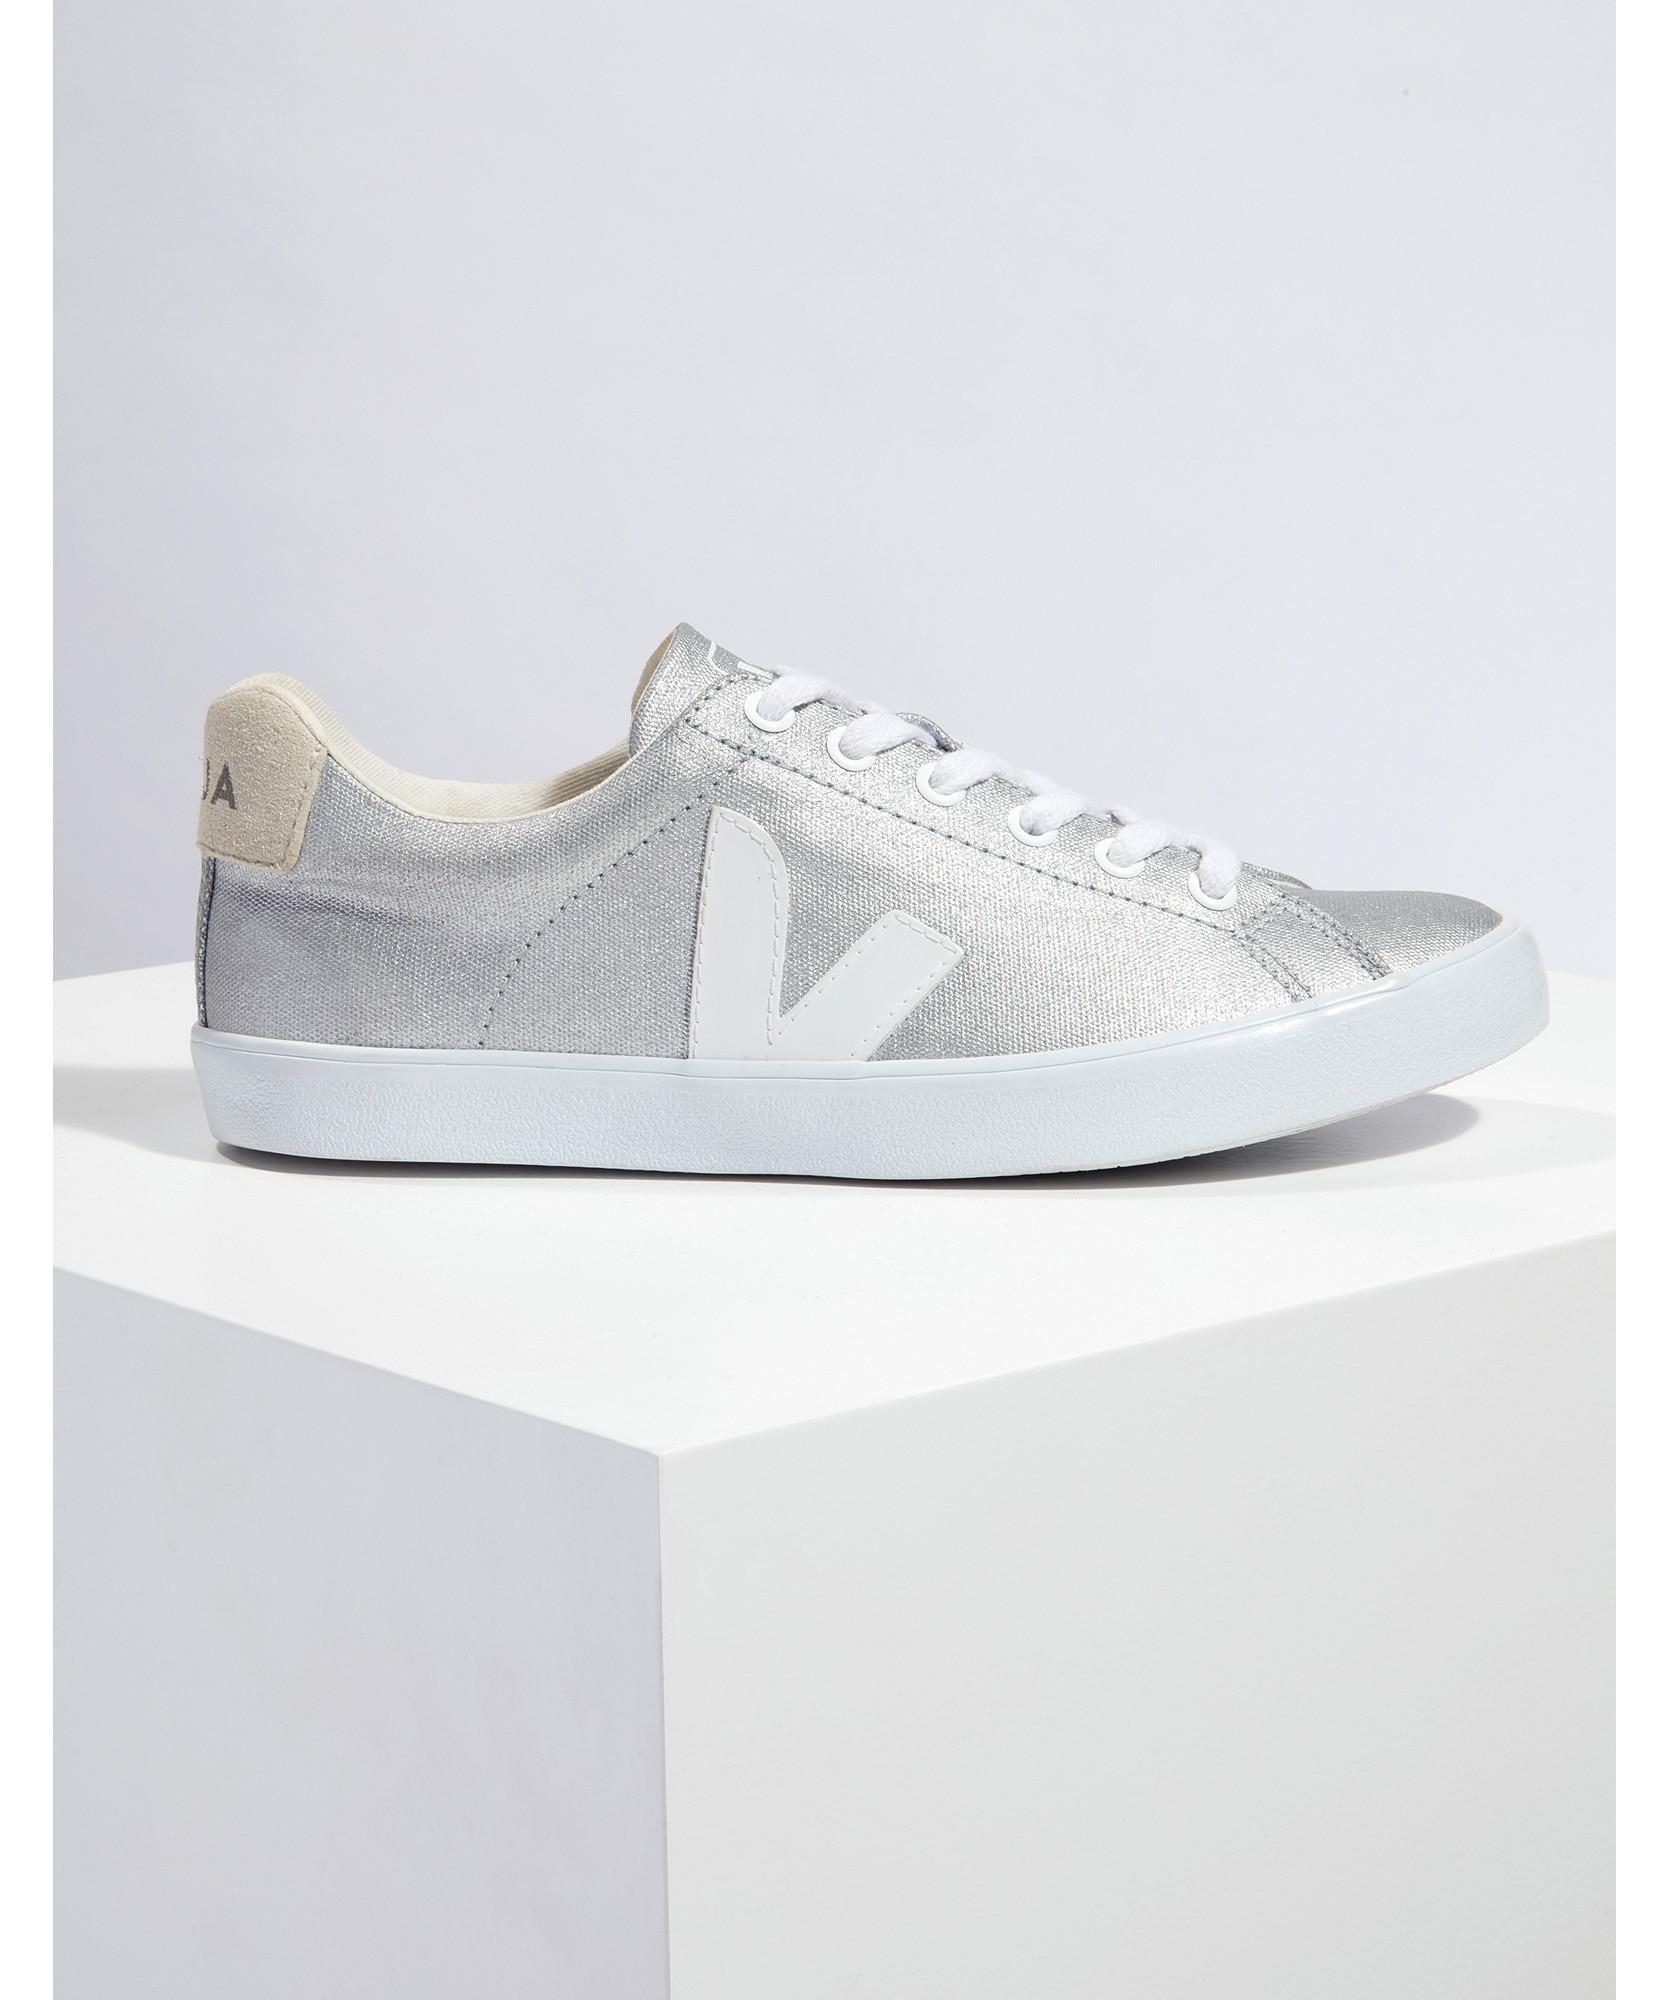 Company Veja Esplar Canvas Sneakers